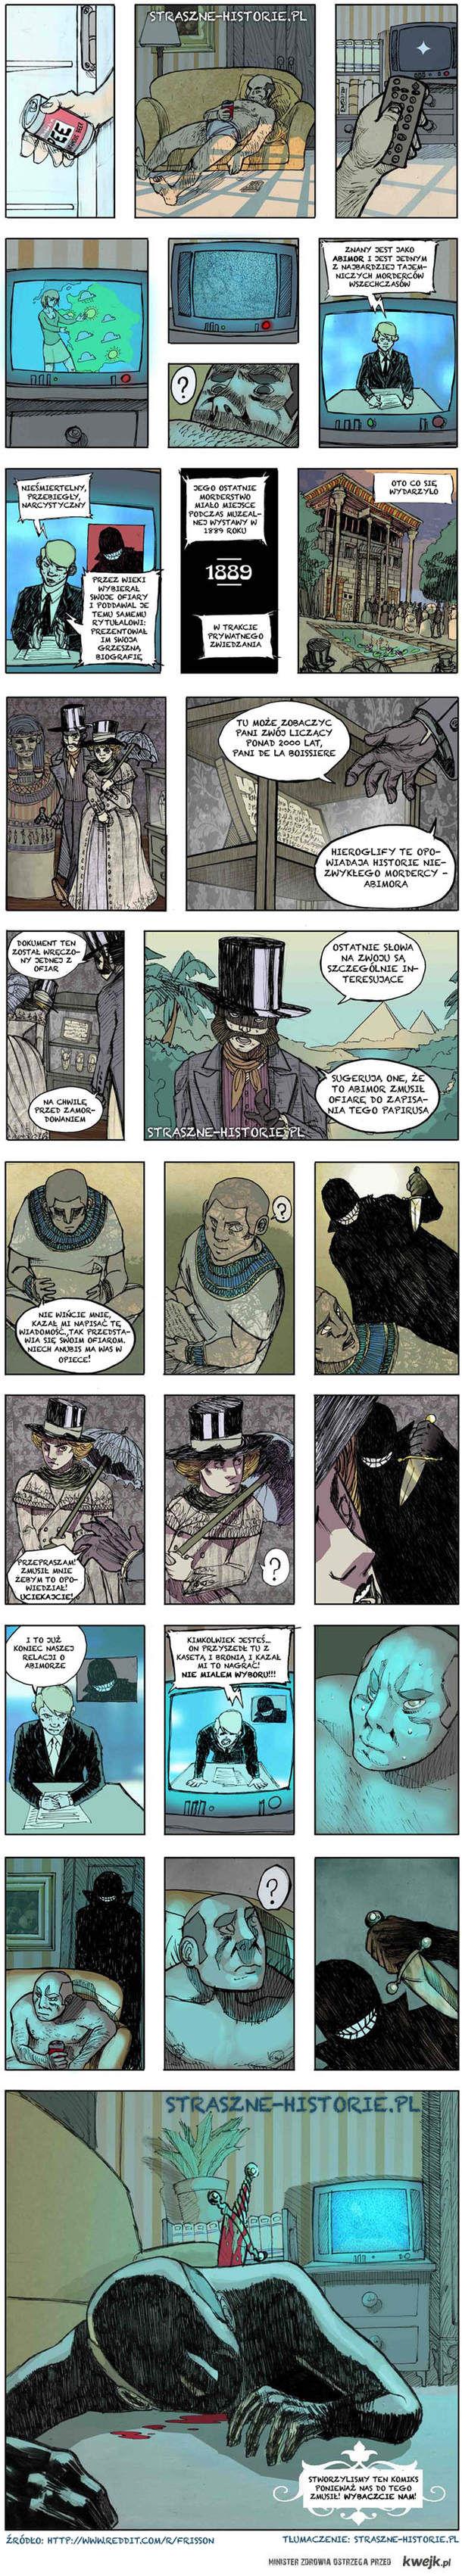 Komiks o mordercy